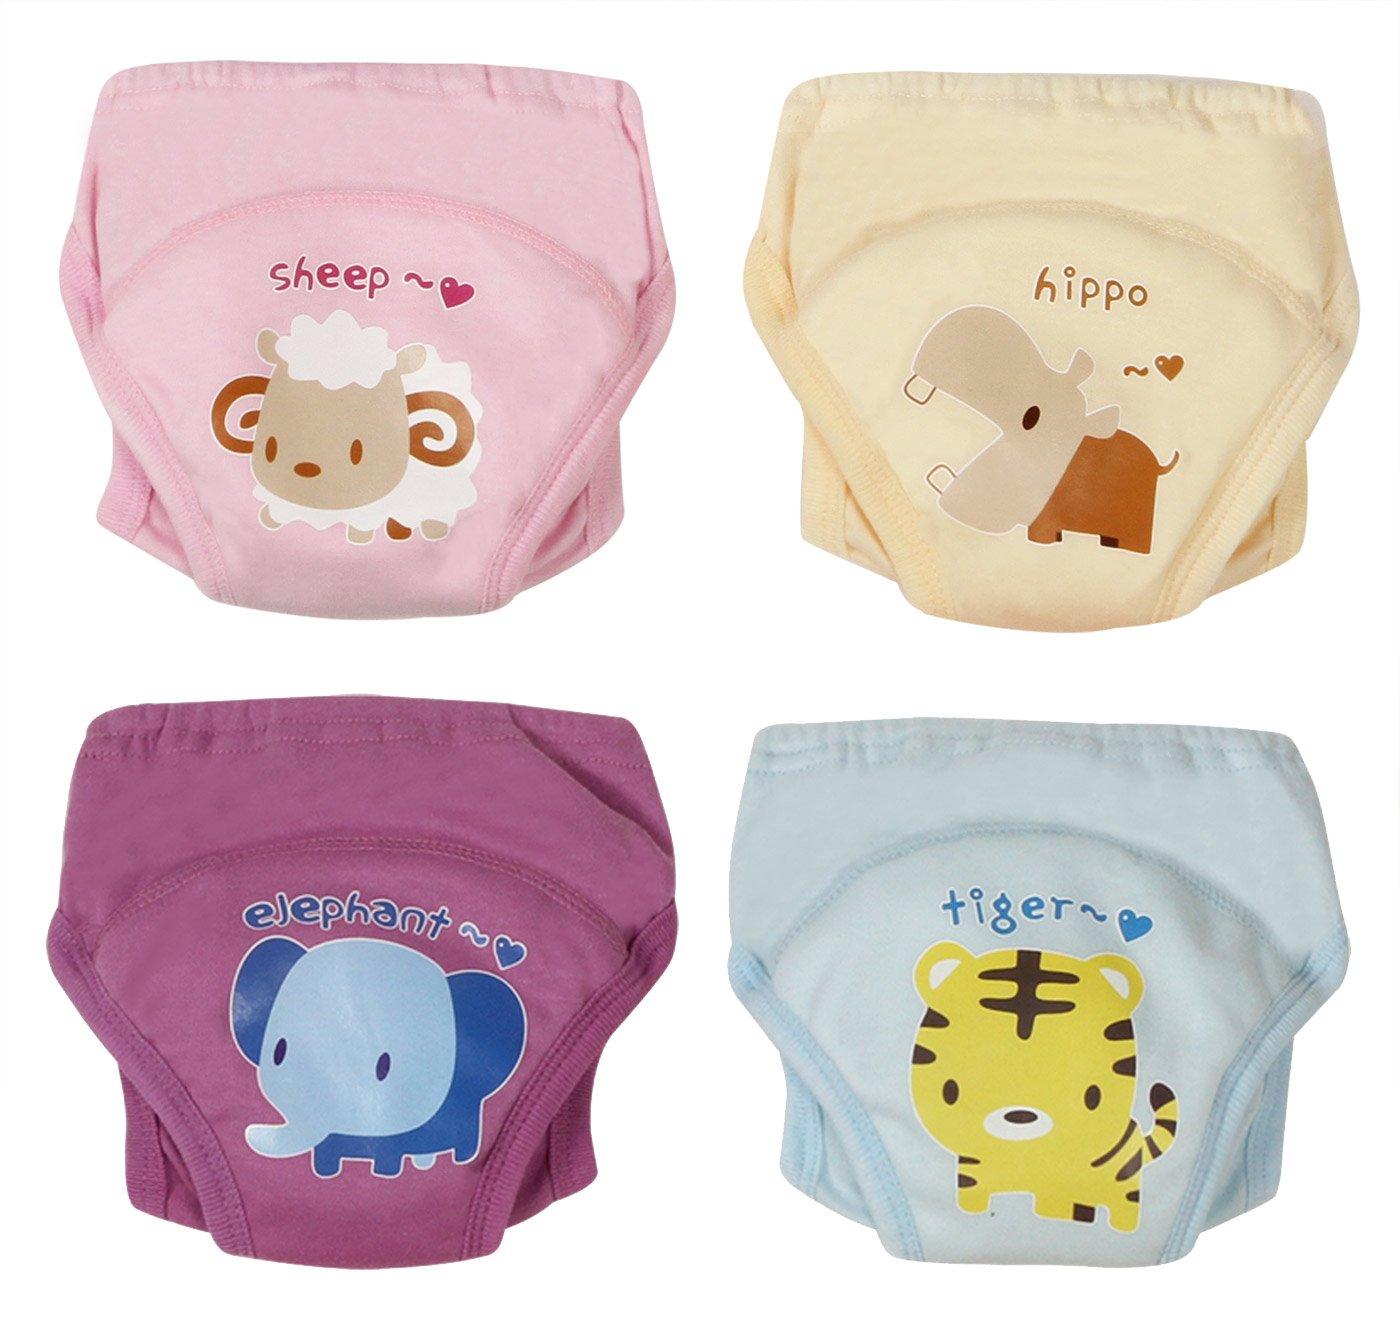 Baby 4 Pack Toilet Training Pants Nappy Underwear 4 Layers Cotton Waterproof TPU Sheep Hippo Giraffe Zebra Size 90 Joyo roy JR001018